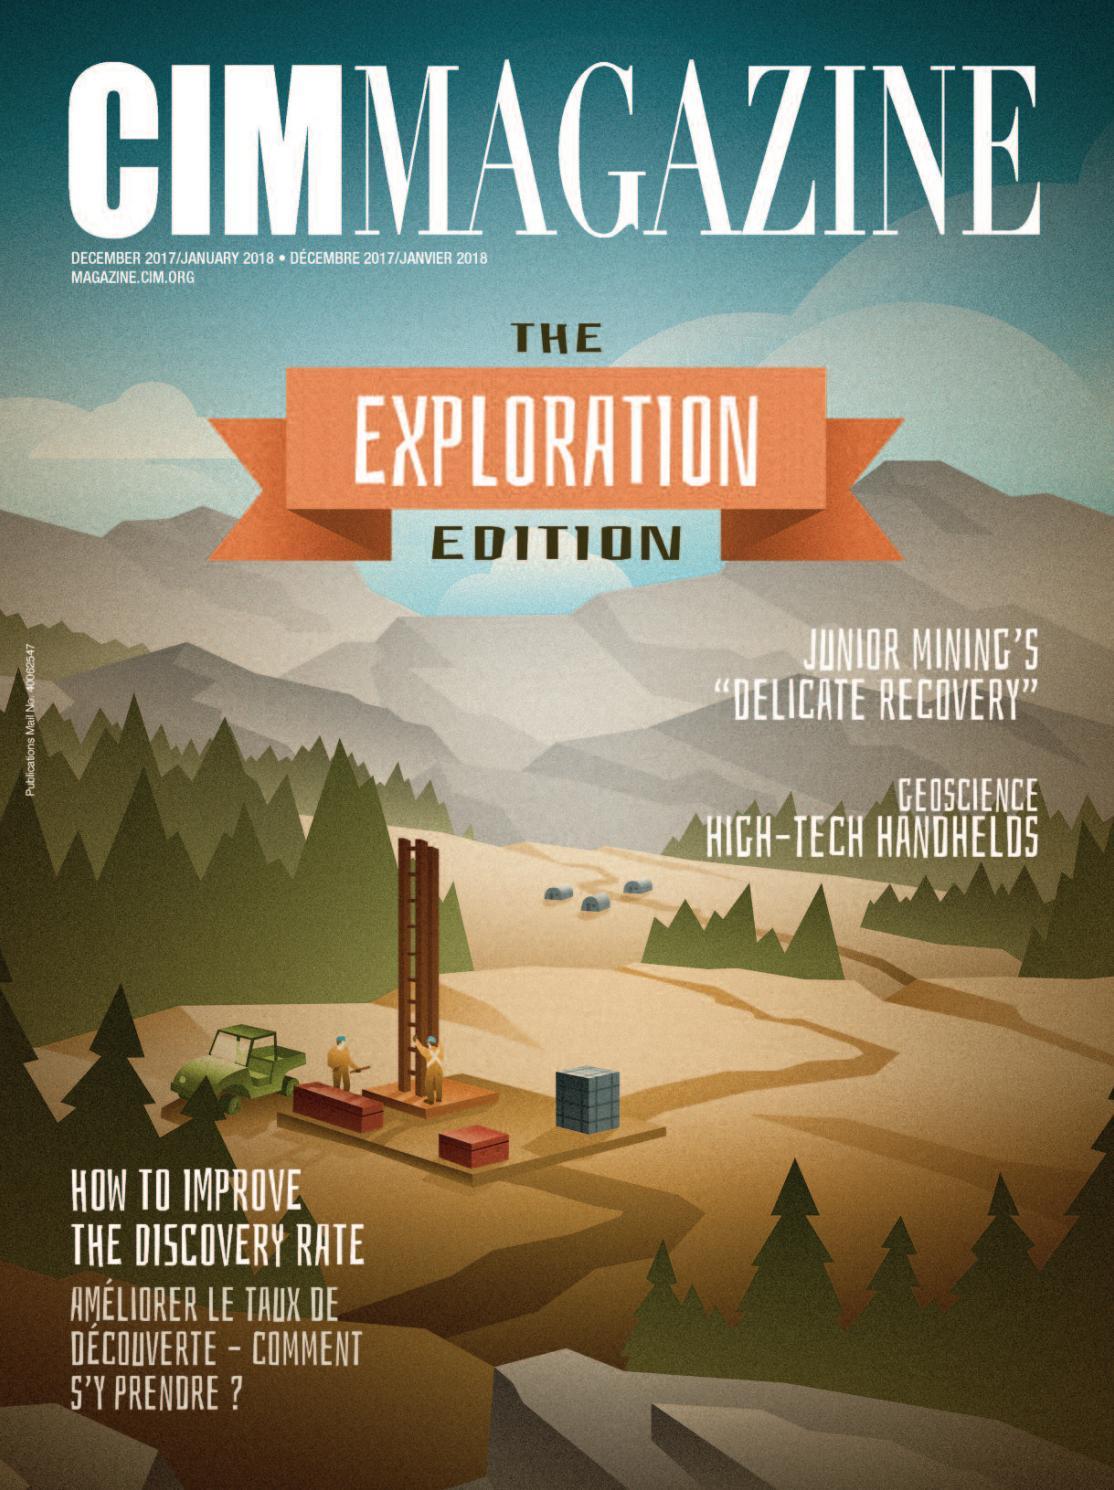 Cim magazine december 2017 january 2018 by cim icm for Dbi sala colombia